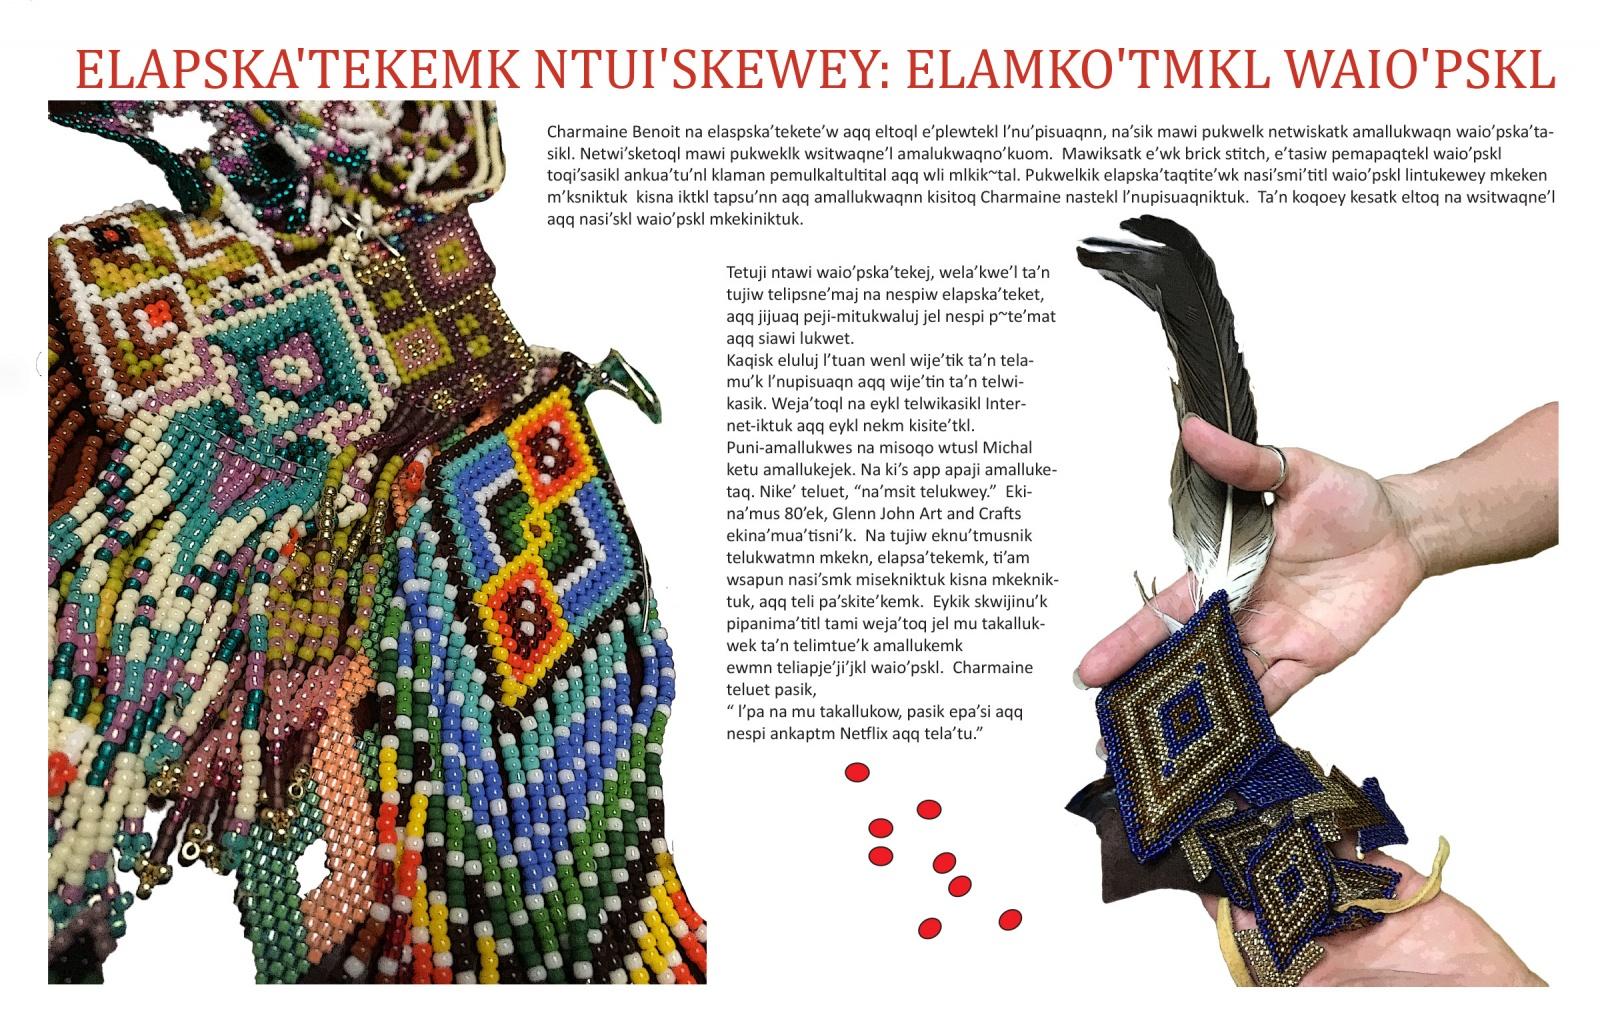 Elapska'tekemk Ntui'skewey: Elamko'tmkl Waio'pskl